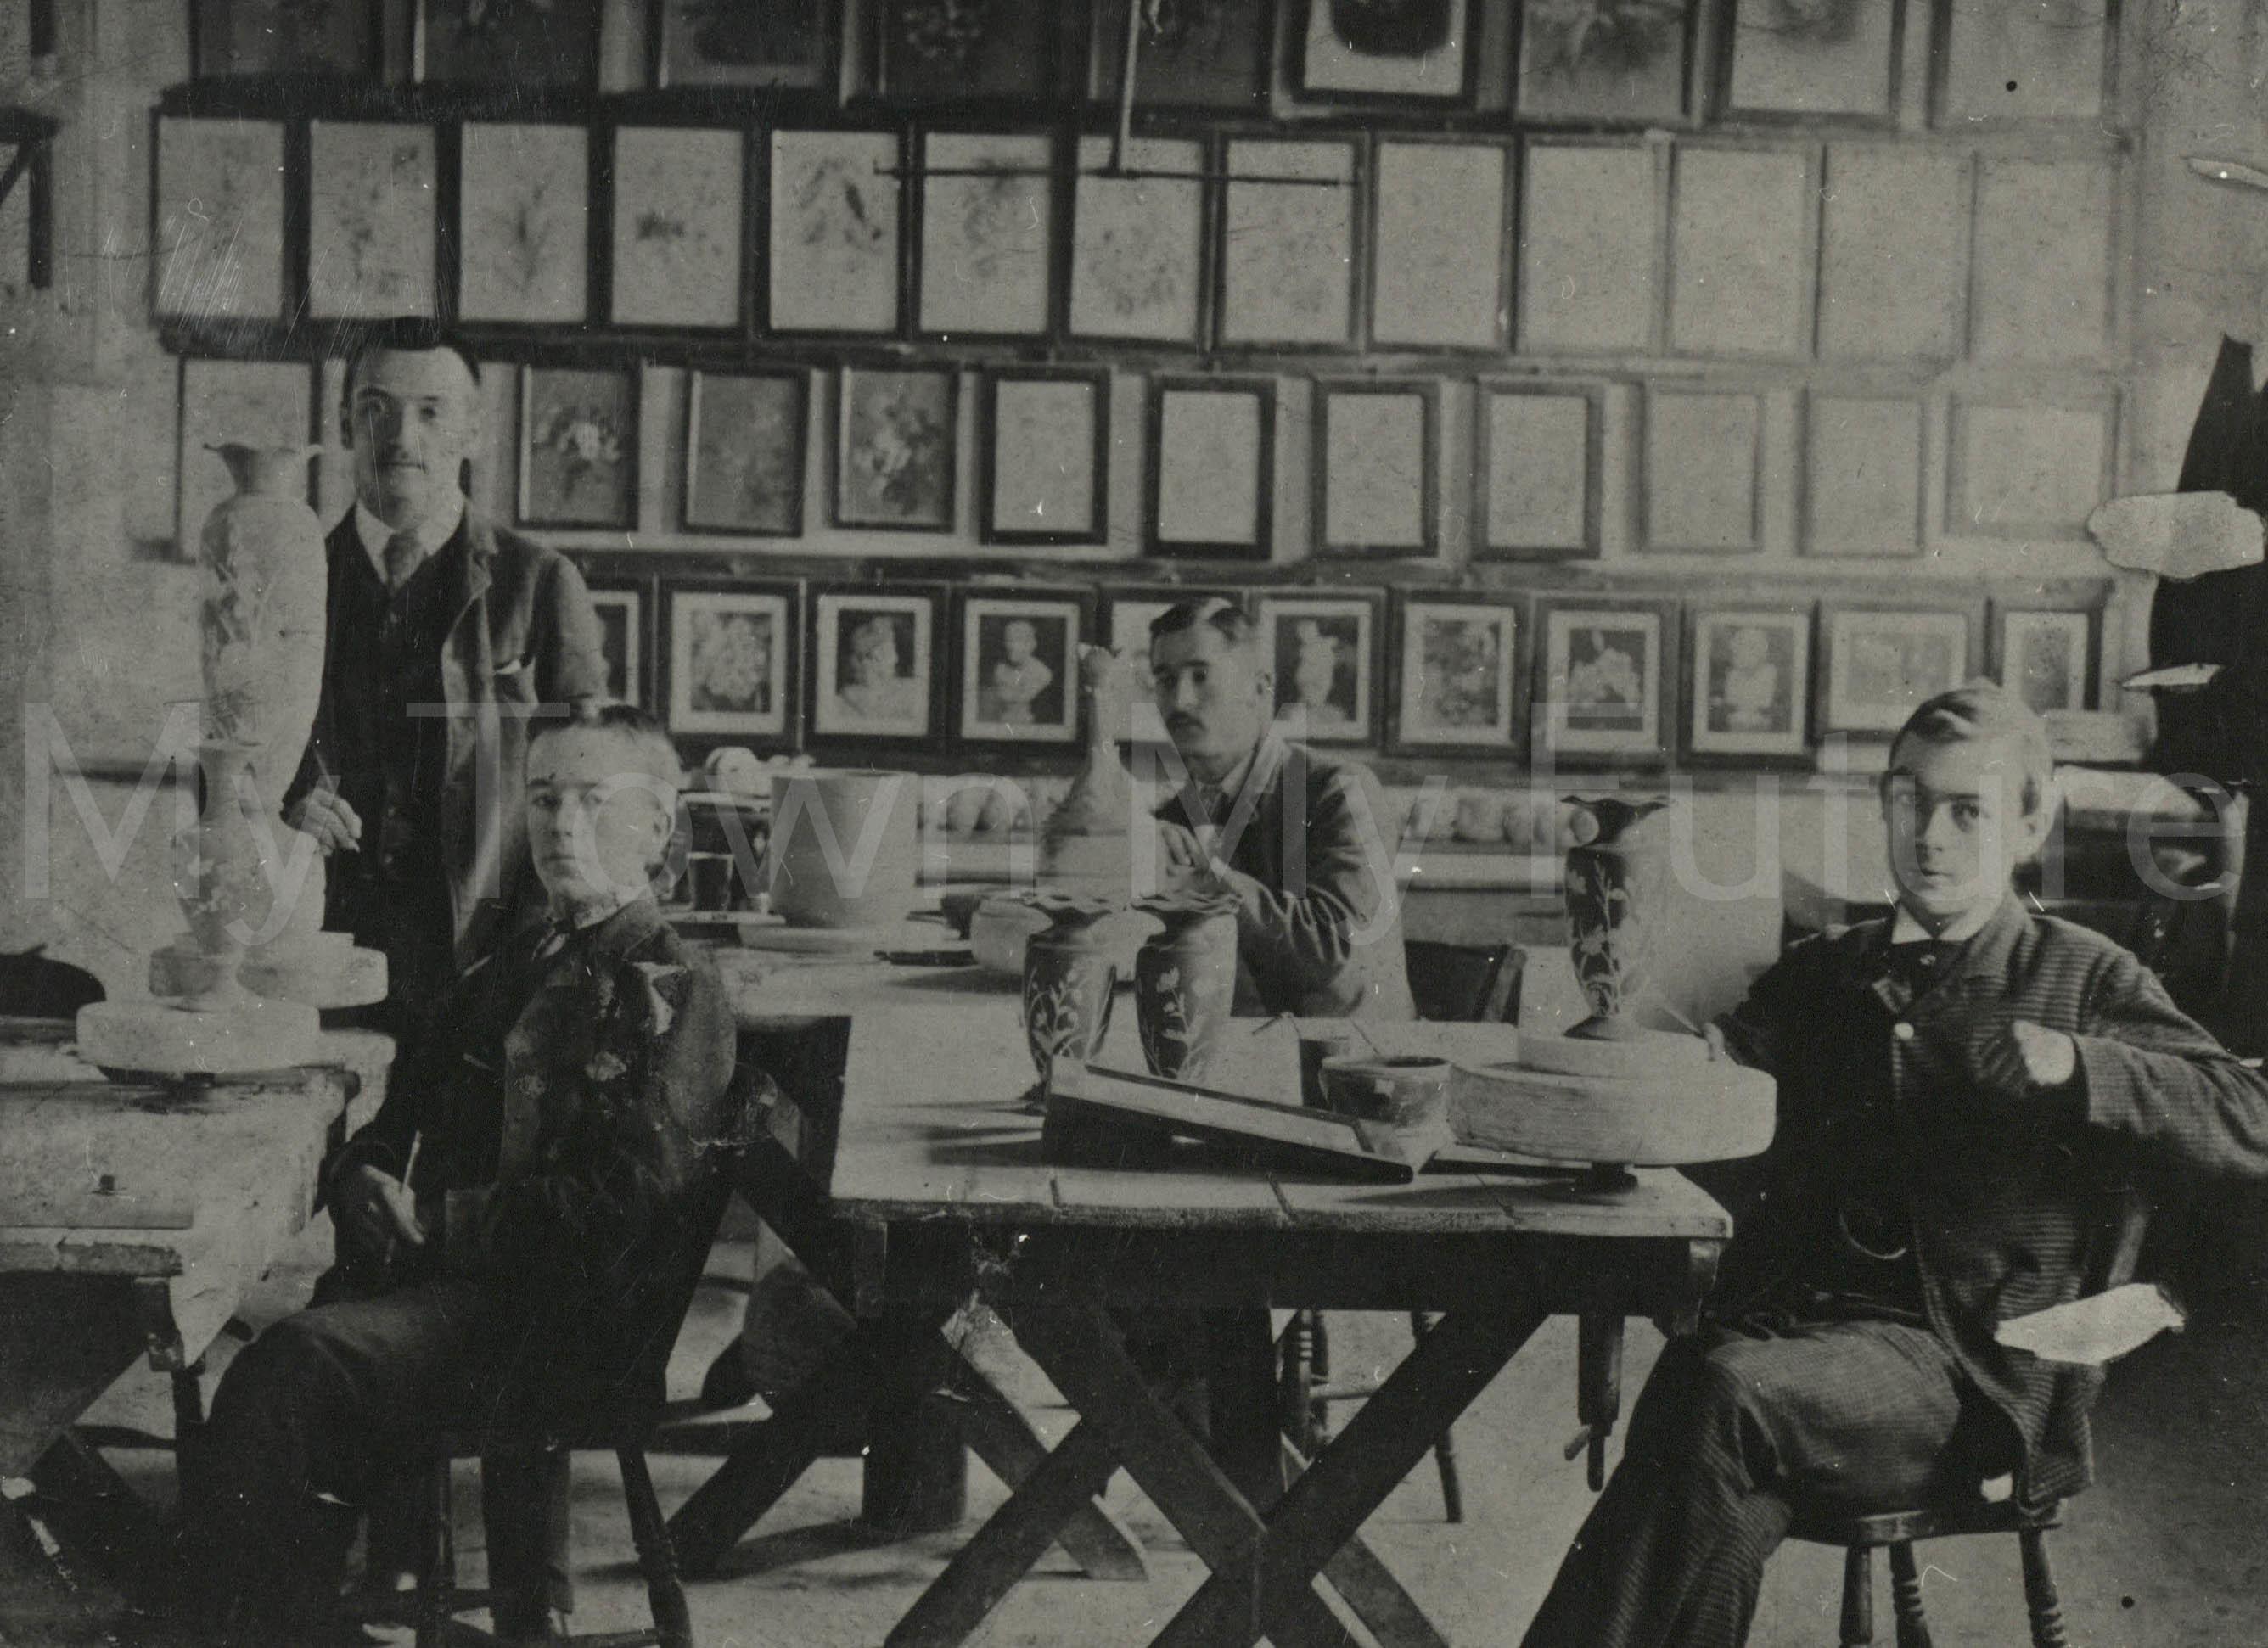 Linthorpe Pottery, 1879-1890, Dorman Museum